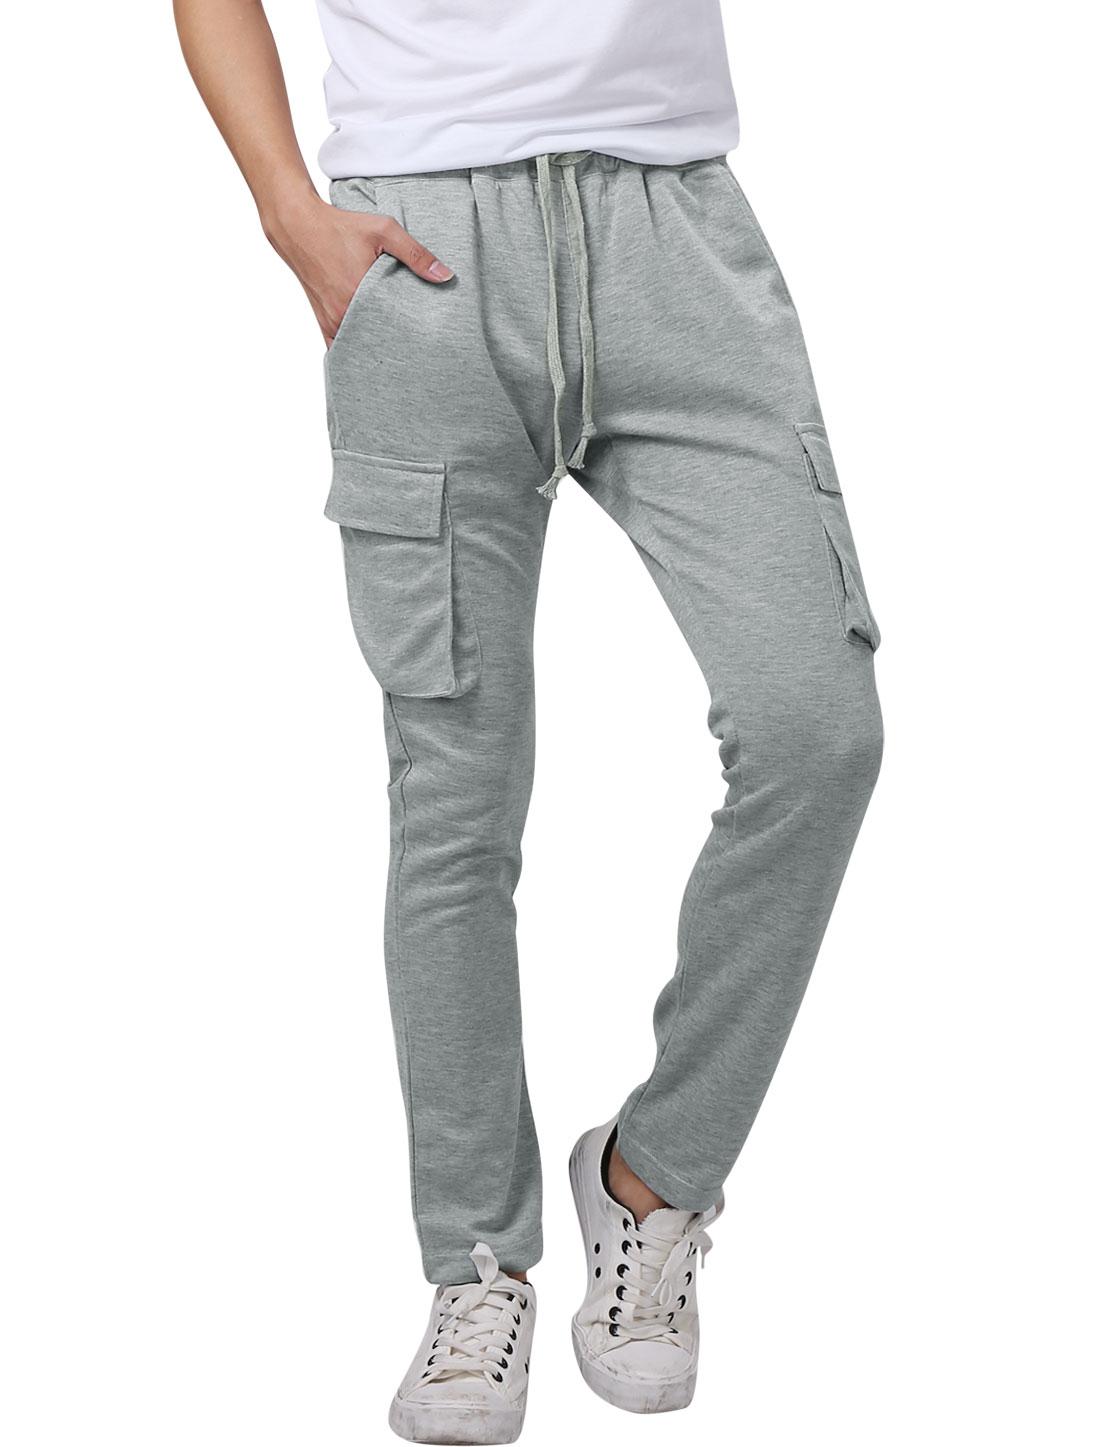 Men Elastic Waist Welt Pockets Back Casual Trousers Light Gray W34